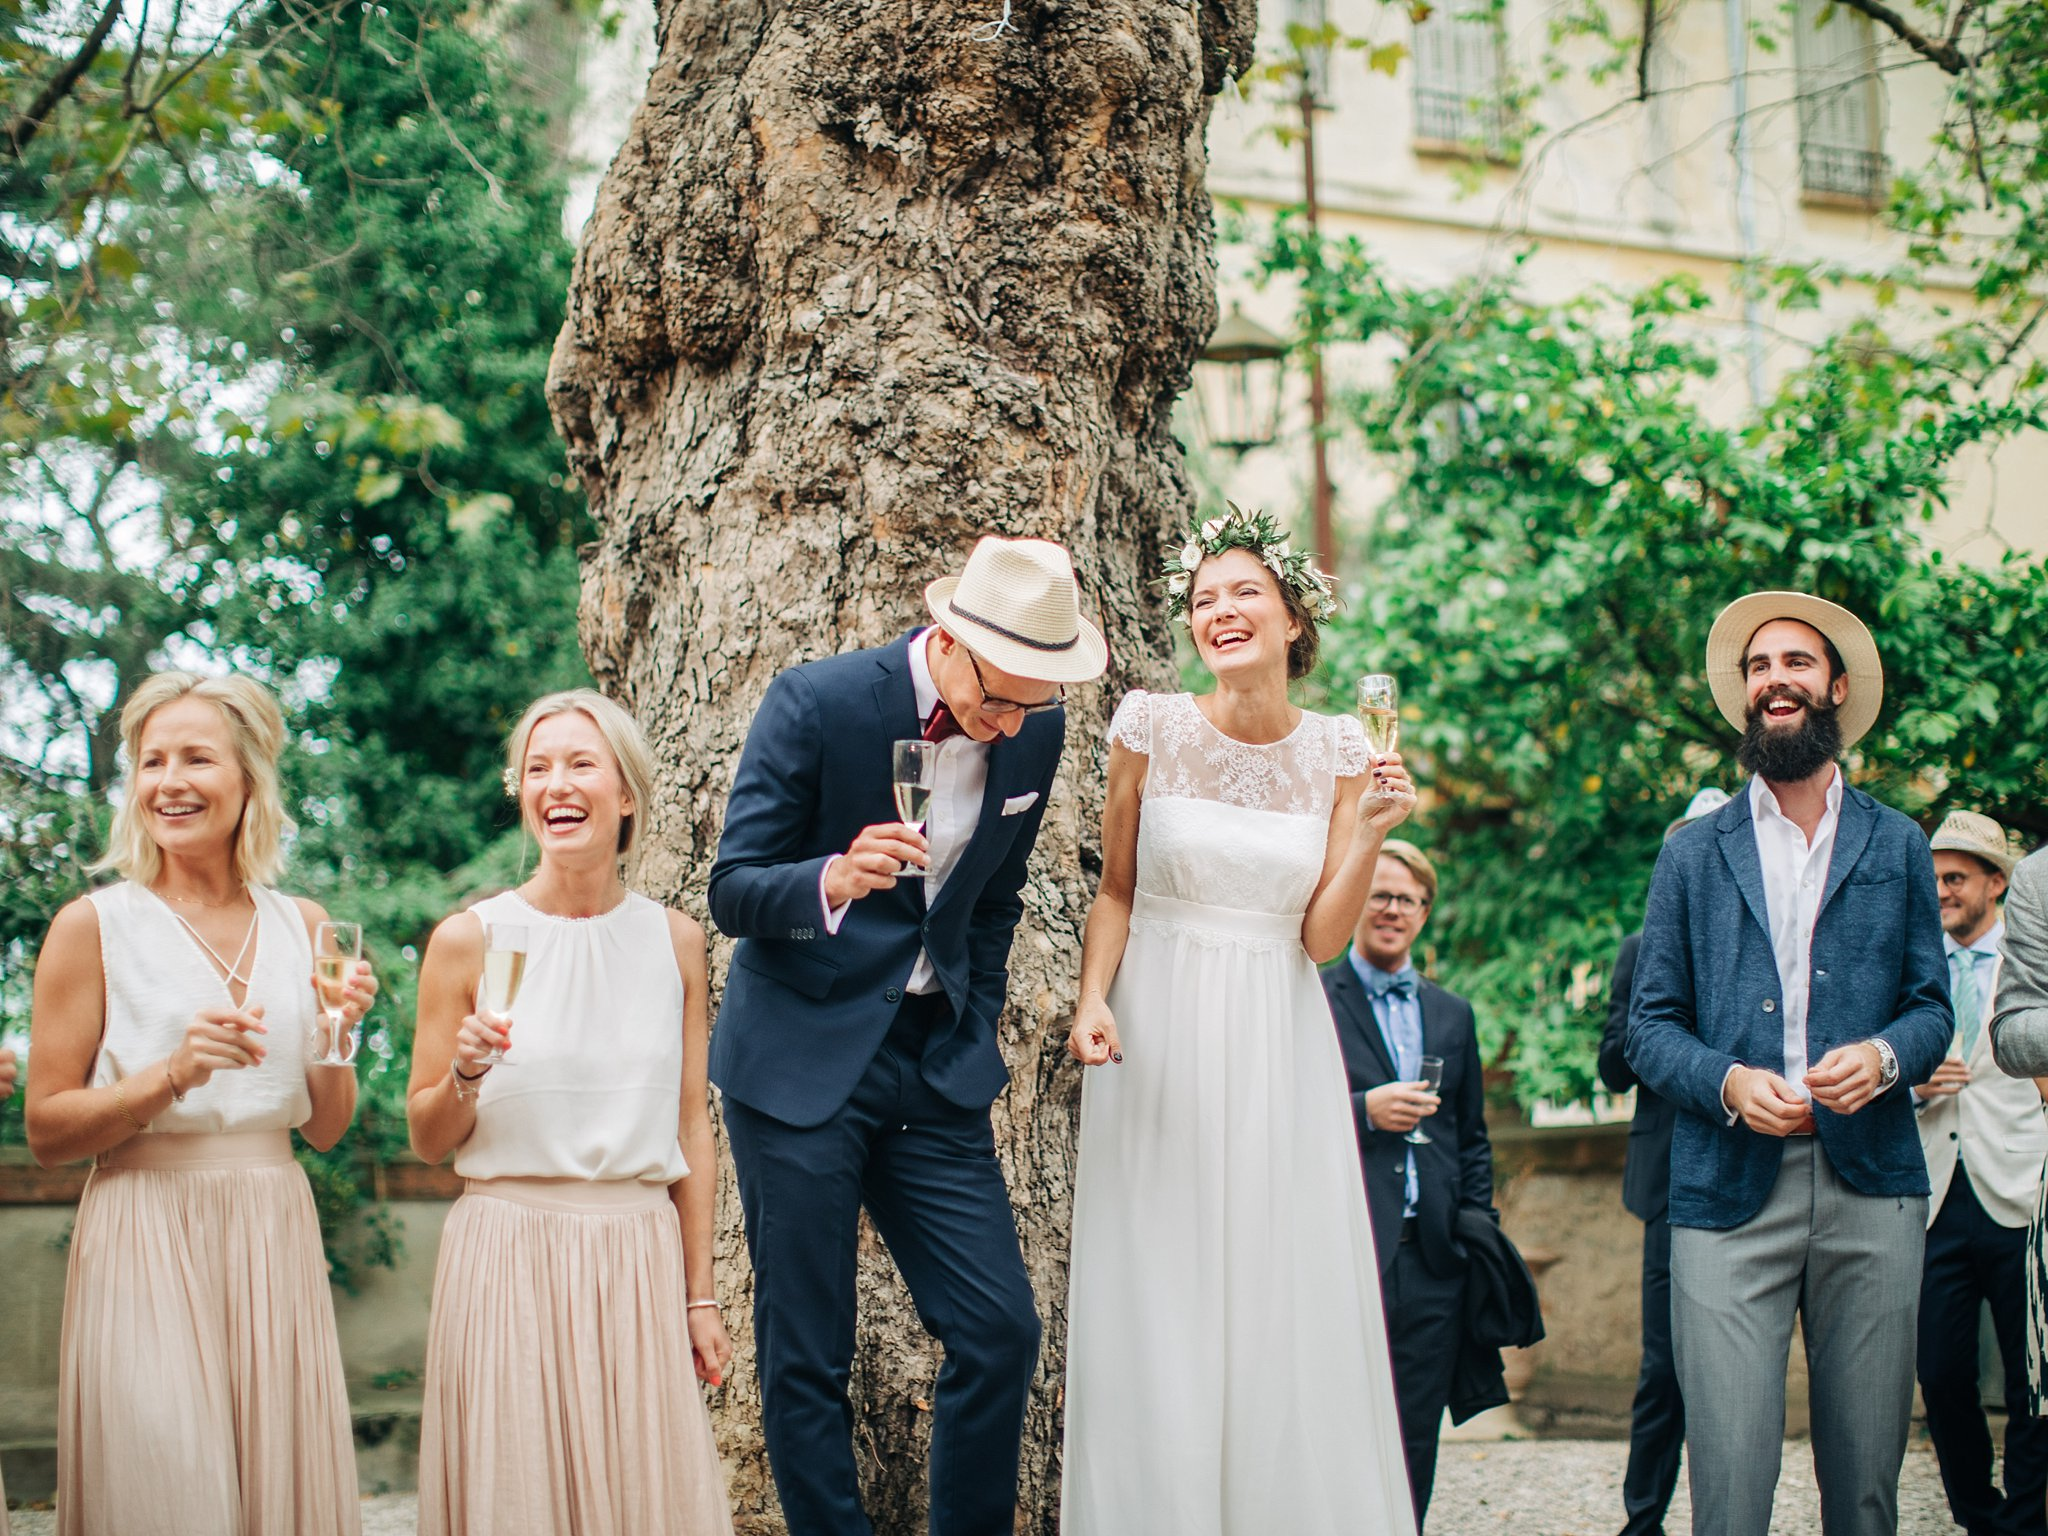 Wedding Photographer Perpignan - Château Las Collas Wedding - Hugo Hennequin045.jpg